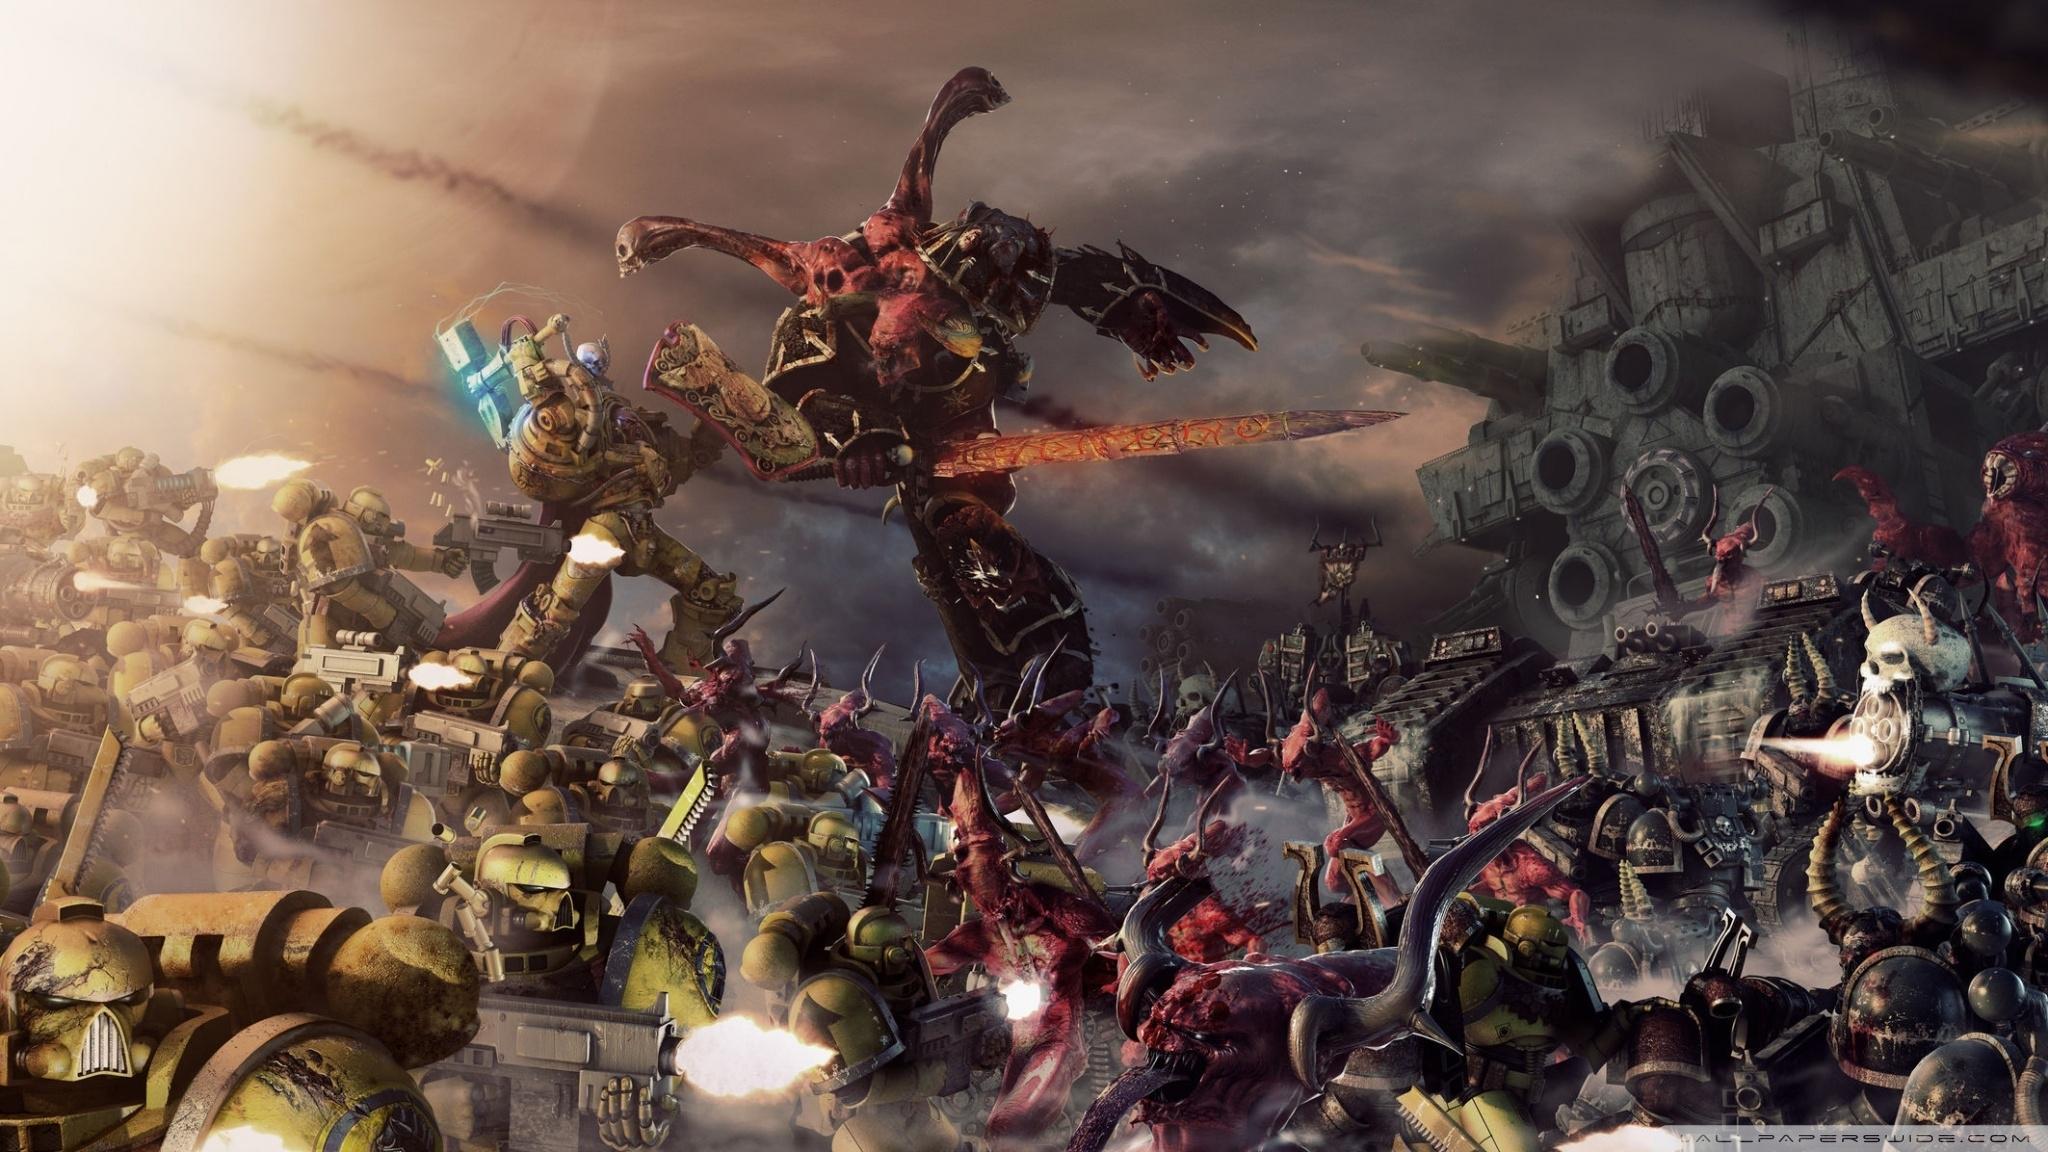 warhammer 40000 battle ❤ 4k hd desktop wallpaper for 4k ultra hd tv